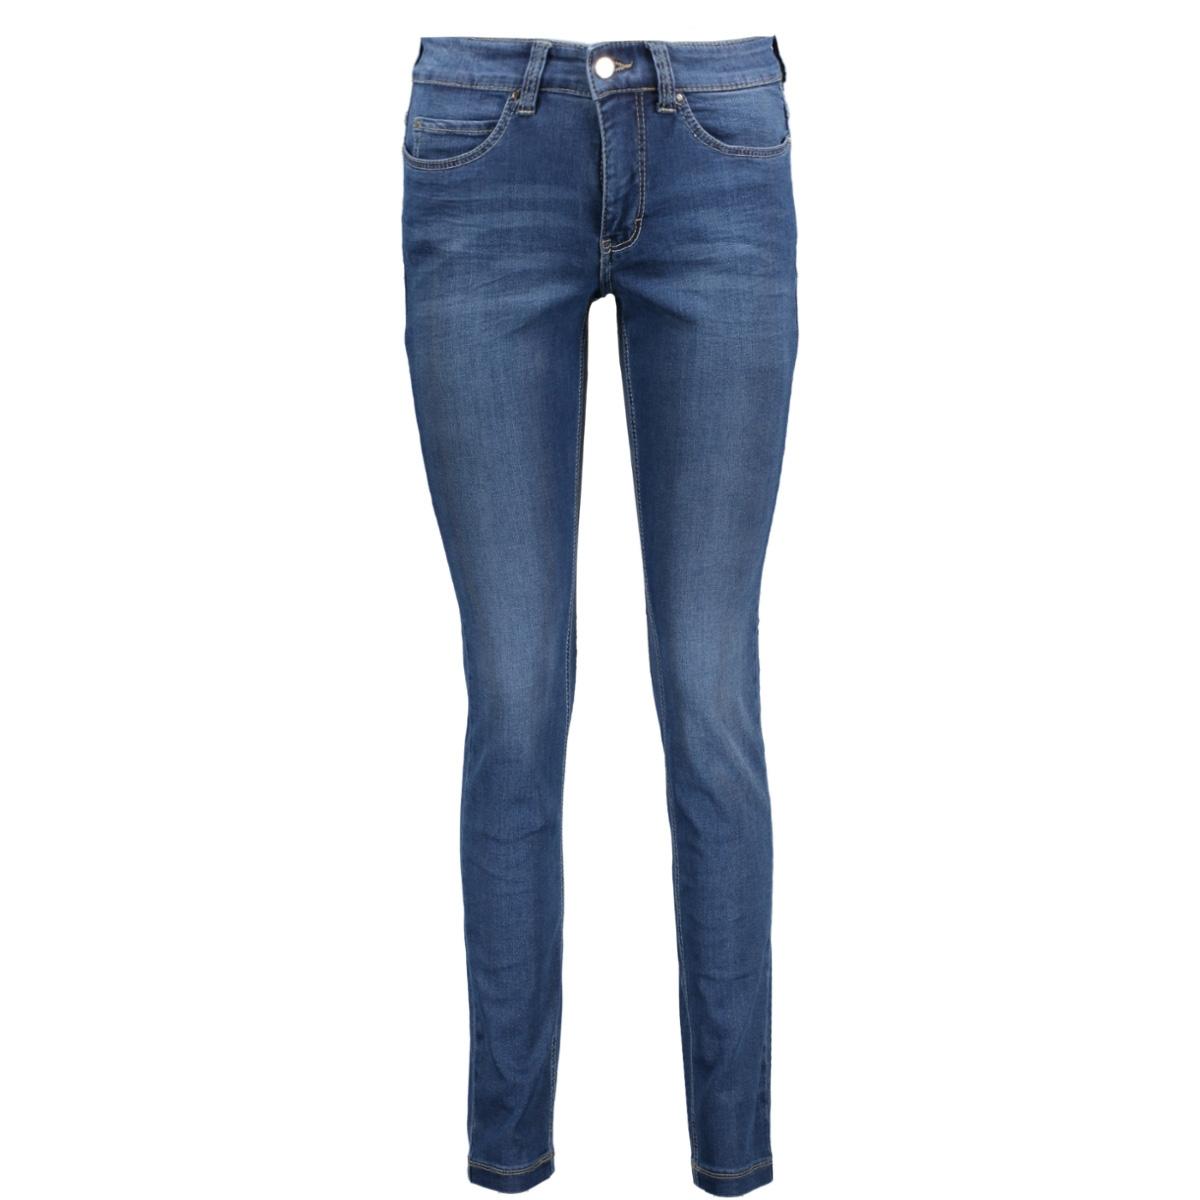 5402 90 0355l 17 mac jeans d569